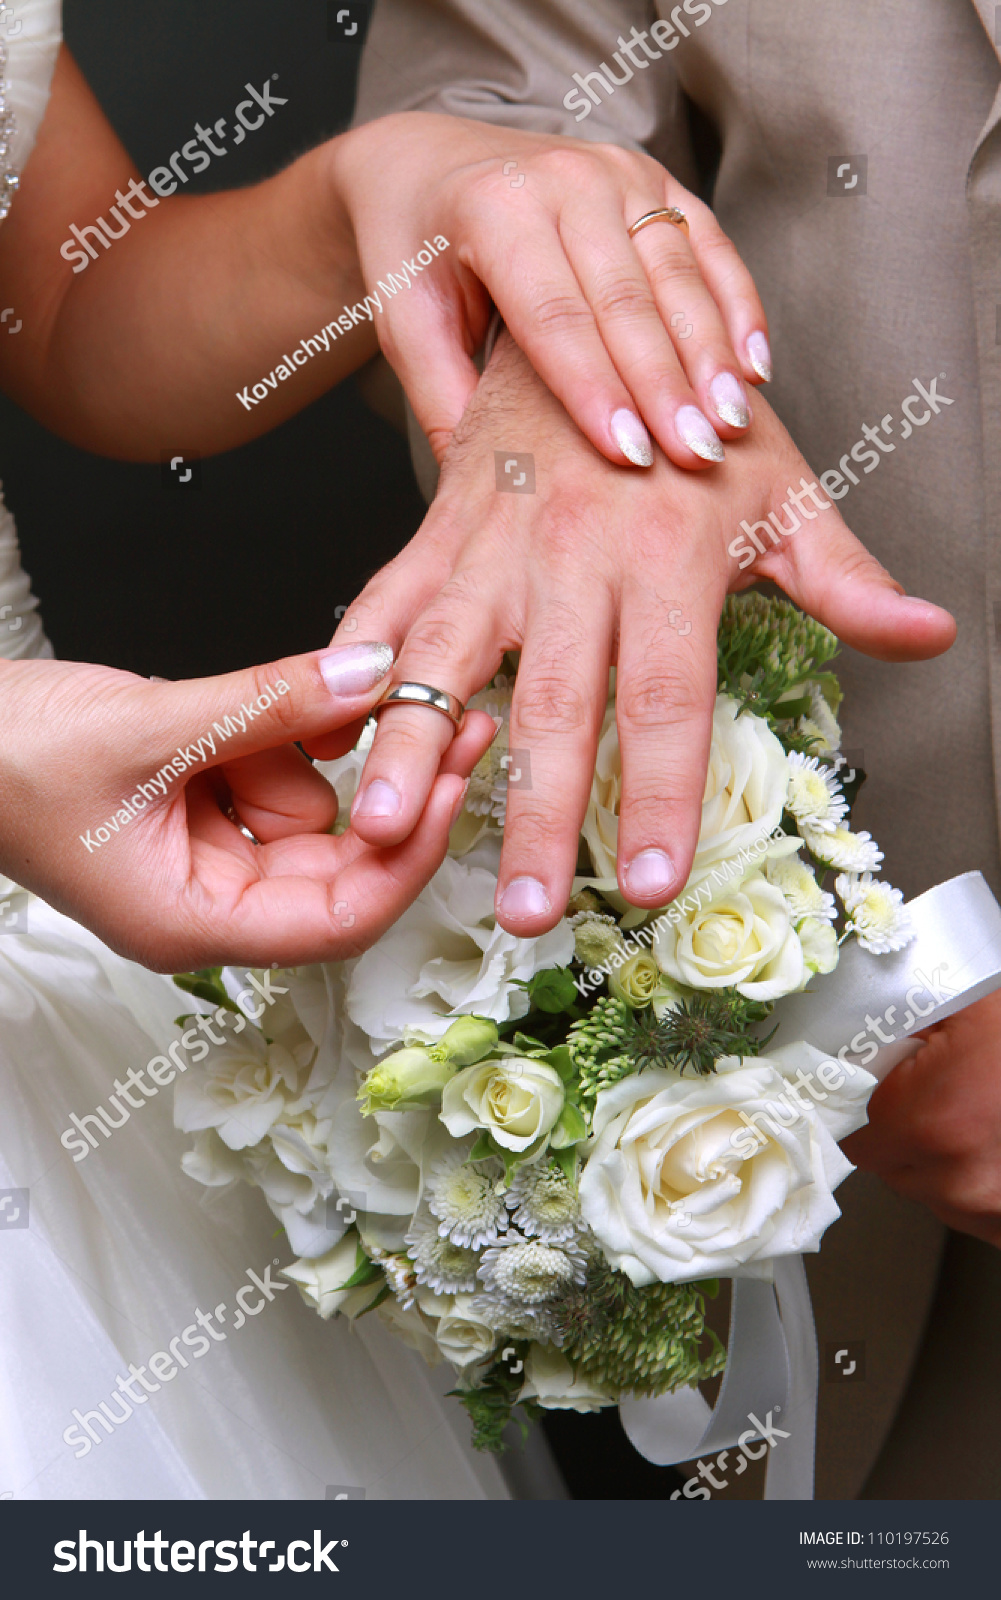 Bride Dresses Wedding Ring Groom Stock Photo (Download Now ...